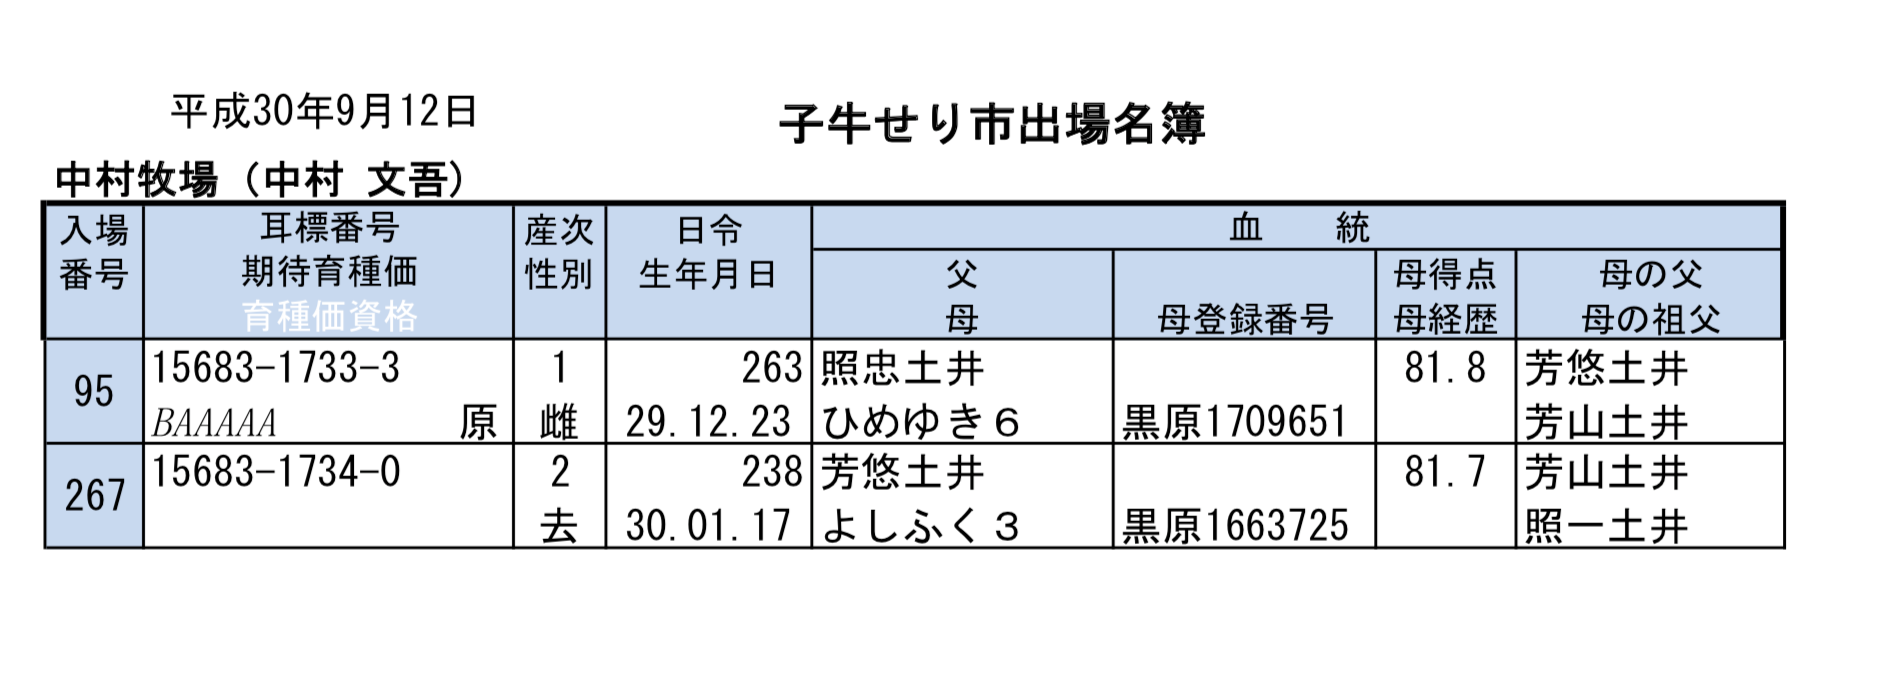 1501koushiichi1